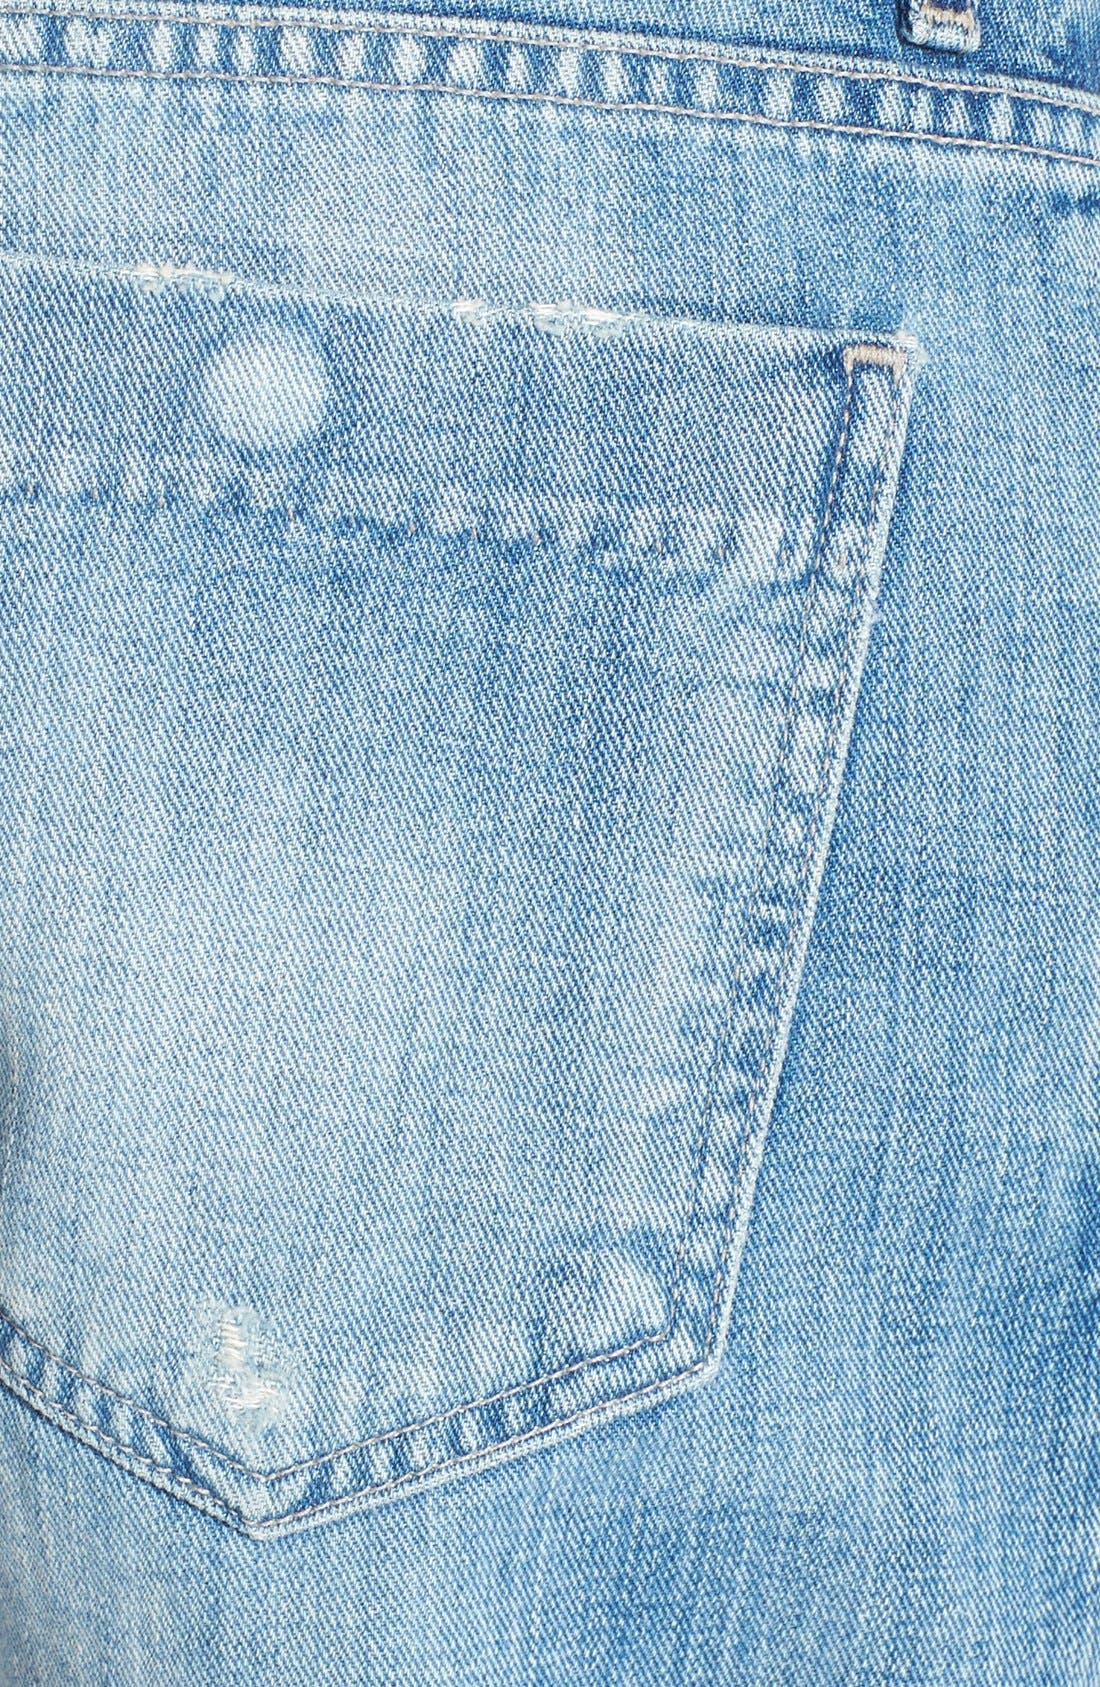 Alternate Image 3  - Citizens of Humanity 'Skler' Denim Shorts (Sebring)